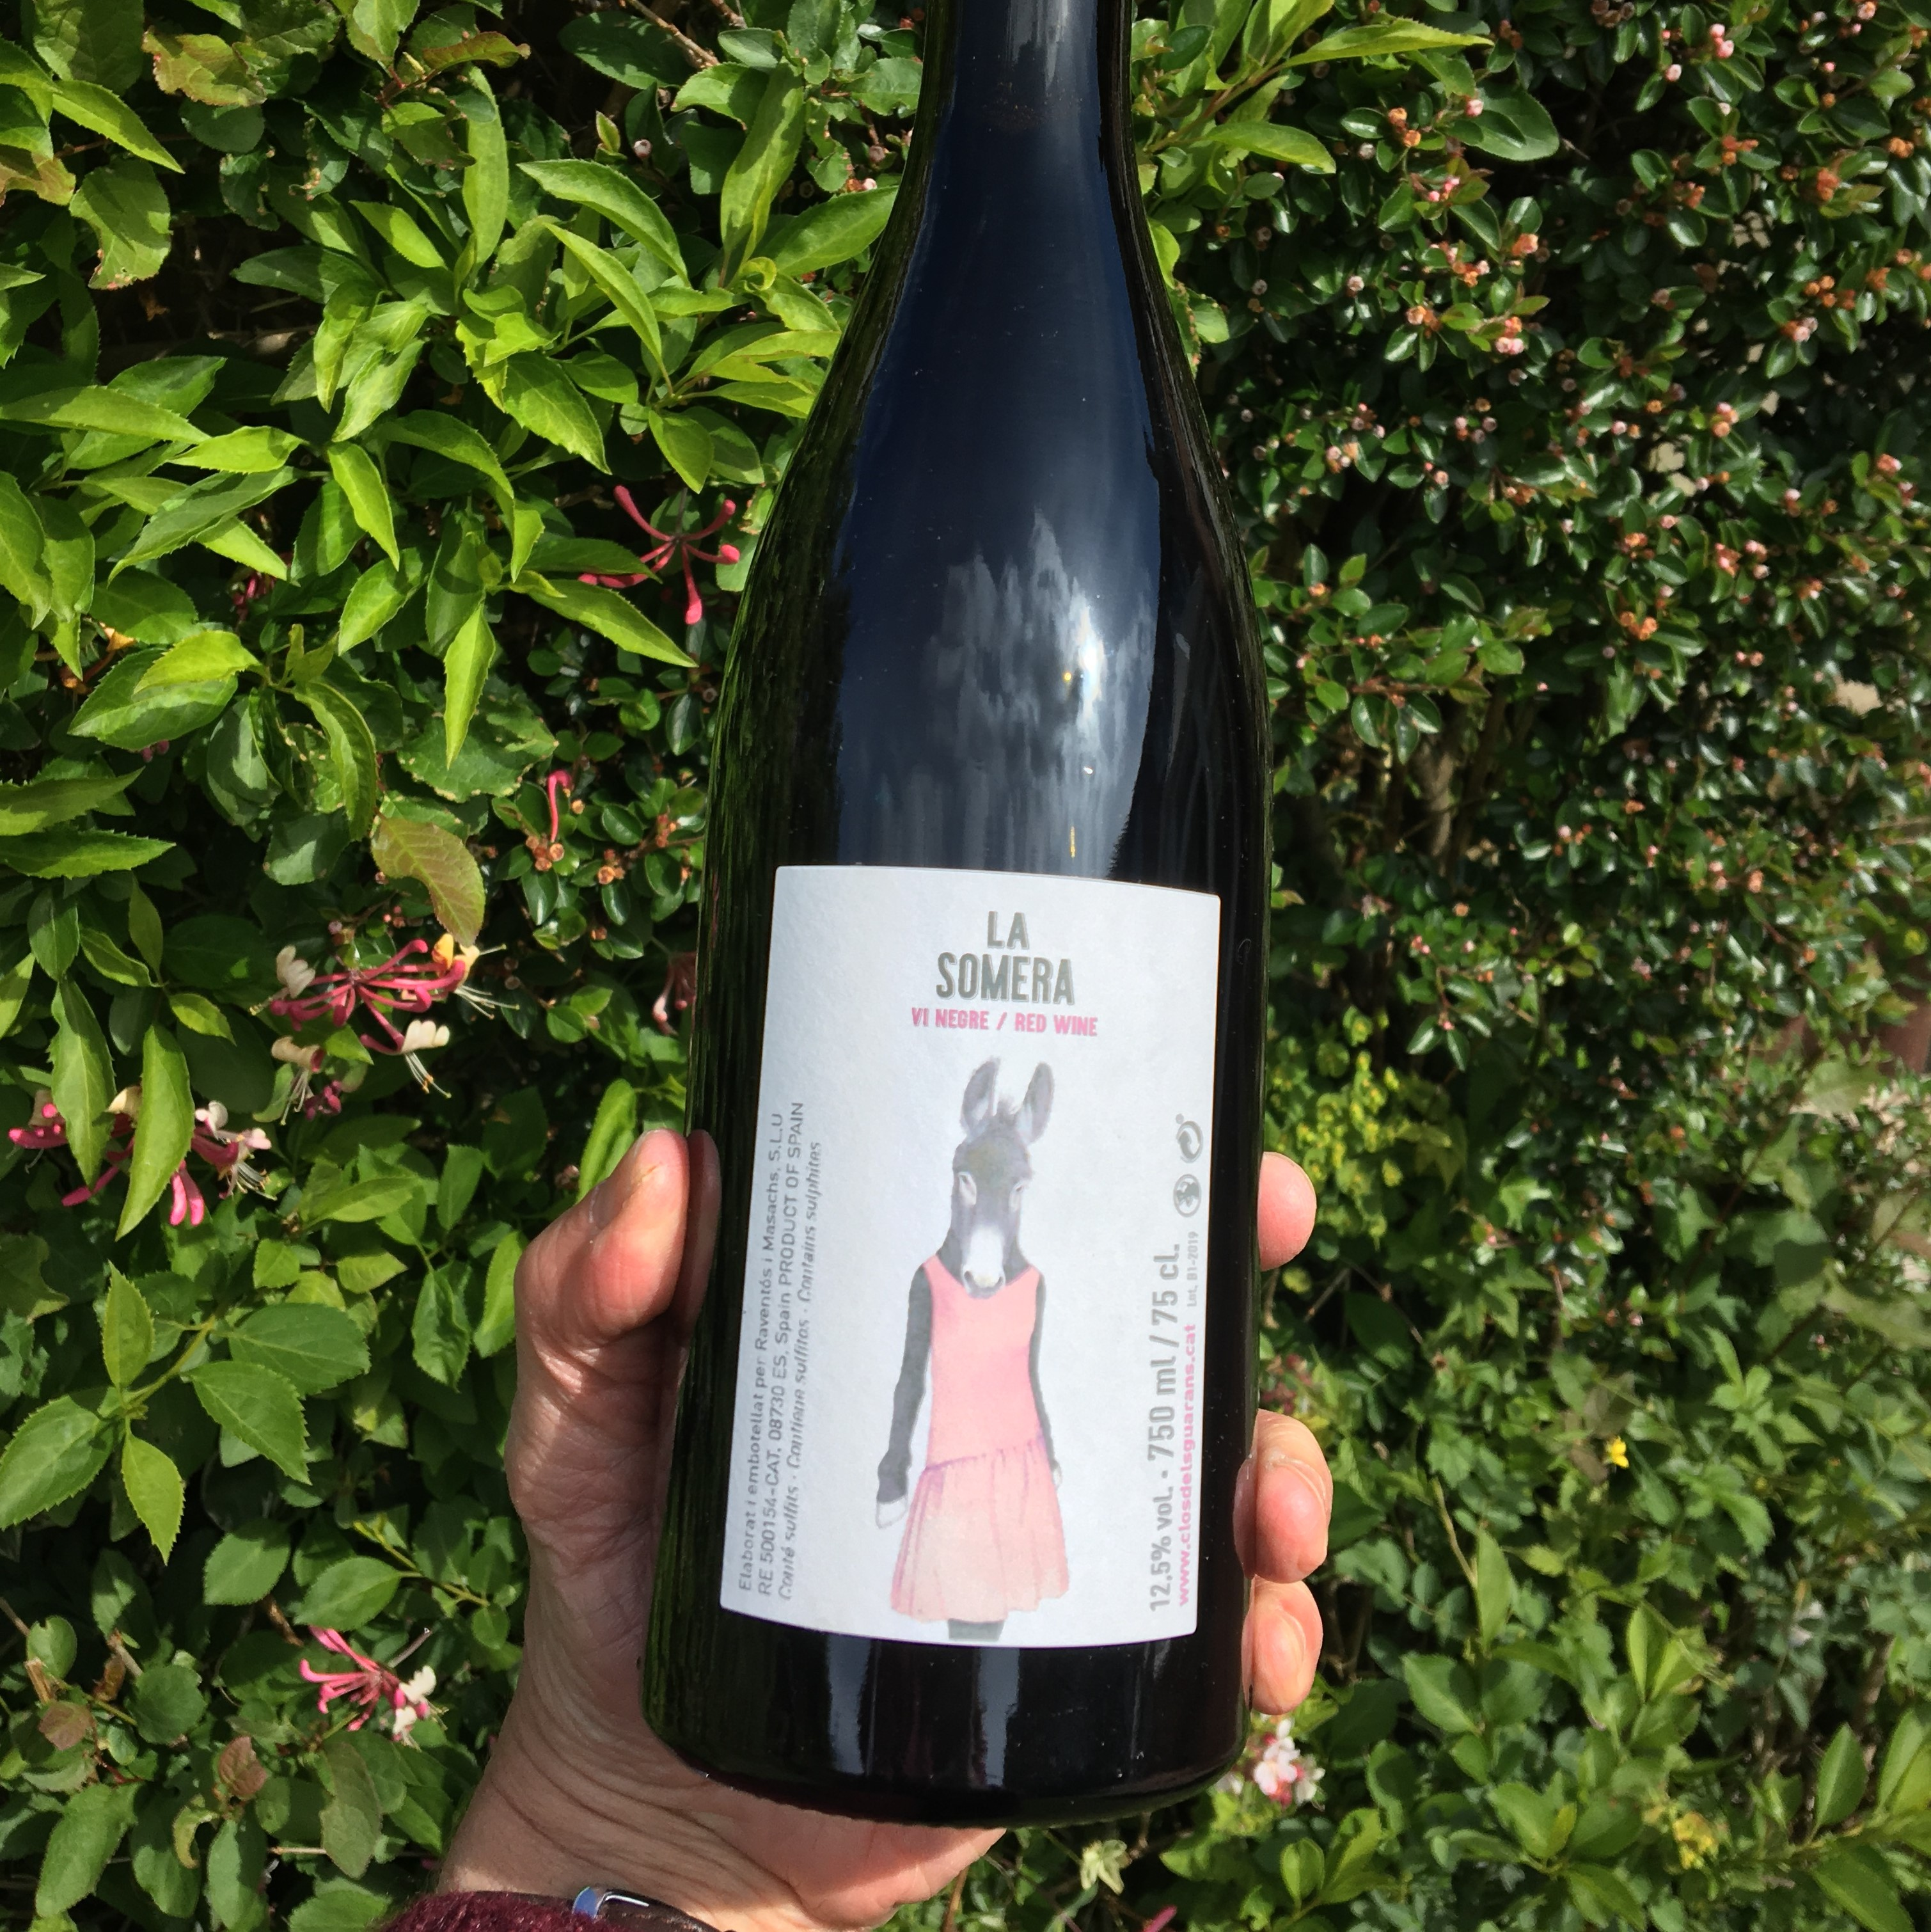 l'altre vi somera merlot